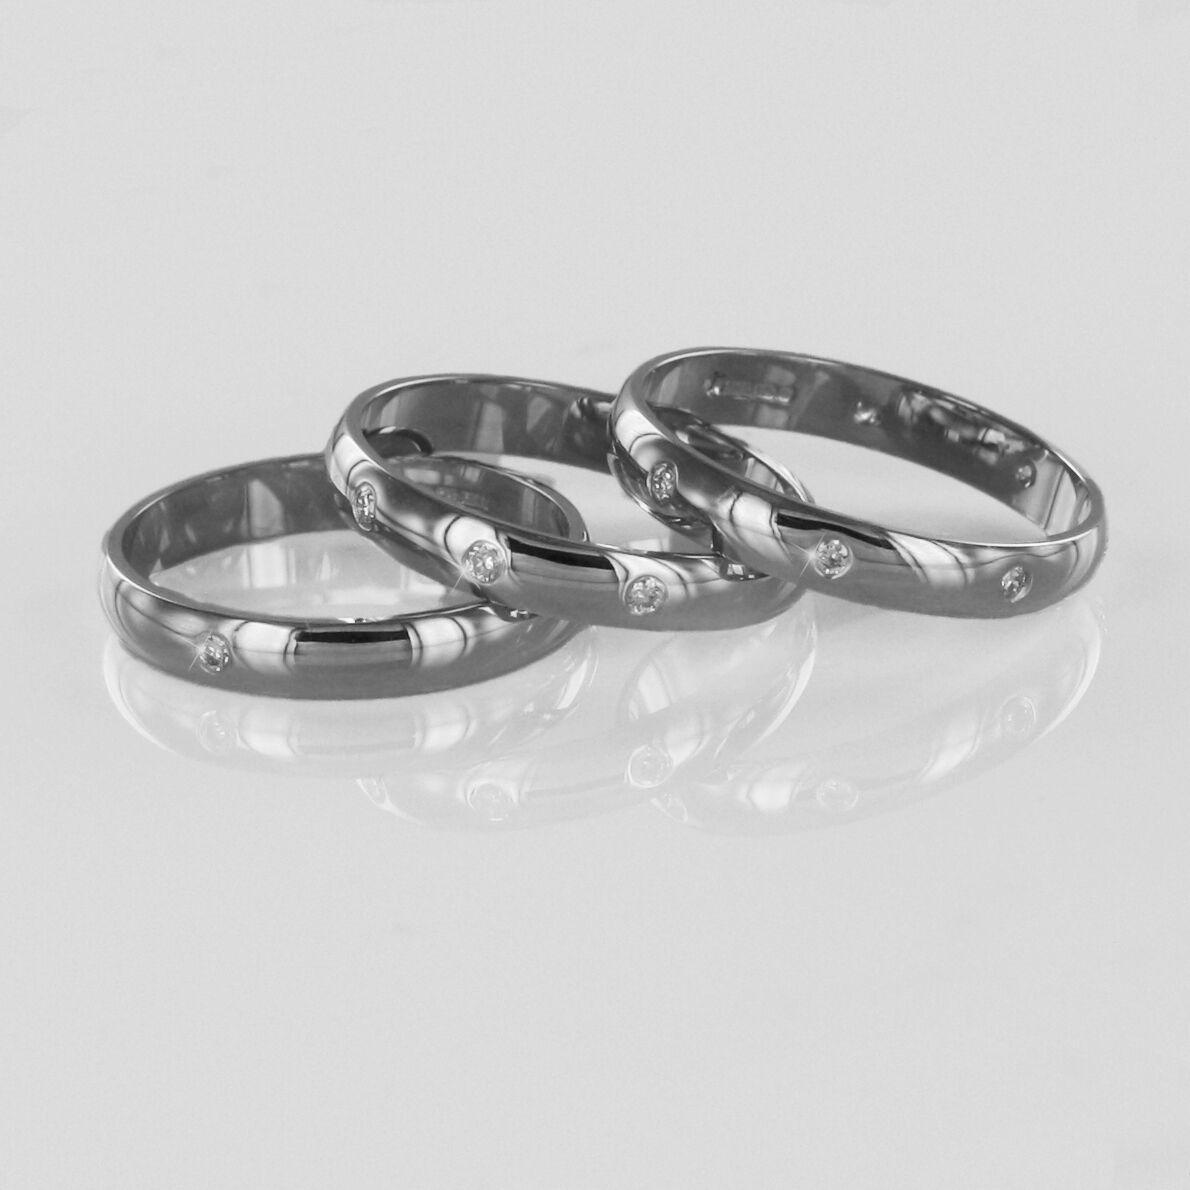 Hallmarked 9ct White gold Diamond Set 3mm Wedding Rings Finger Size H To Q